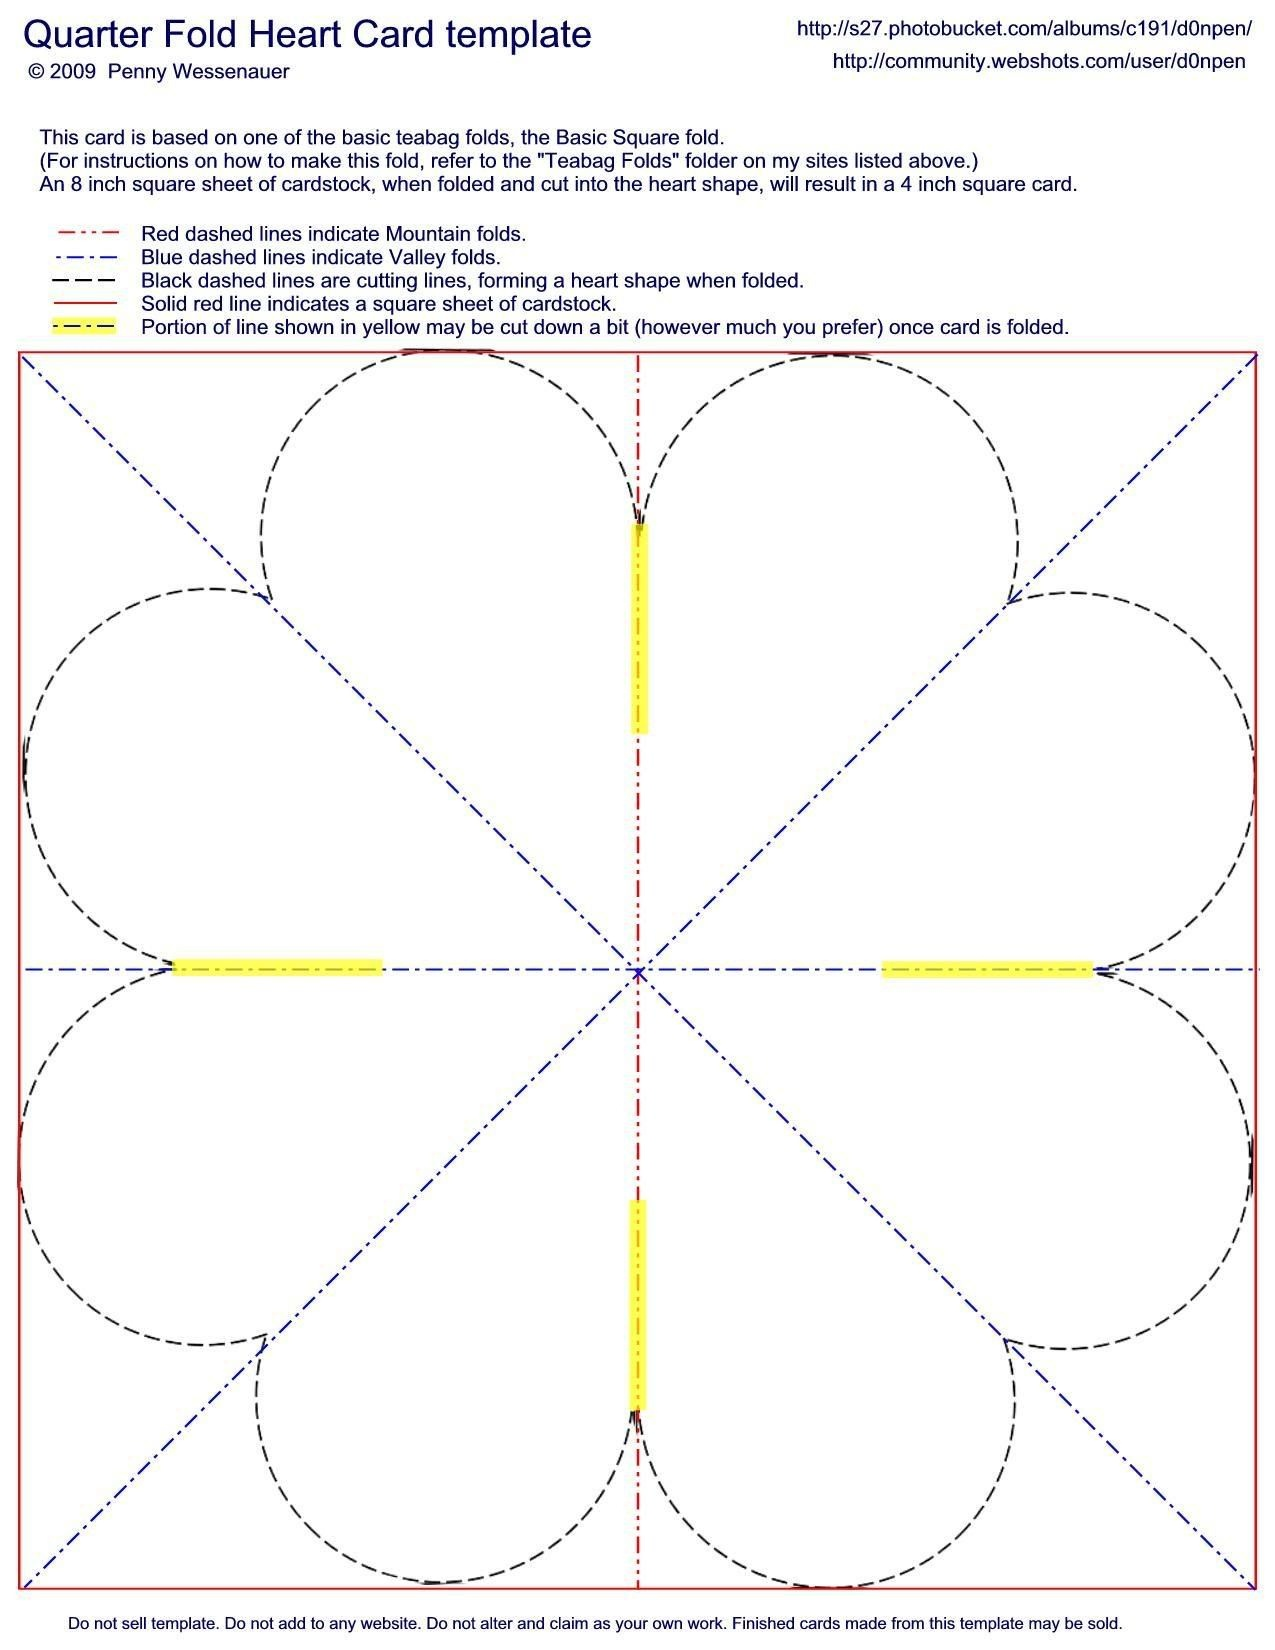 Quarter-Fold Heart Card Template | Valentines | Card Making - Free Printable Quarter Fold Christmas Cards